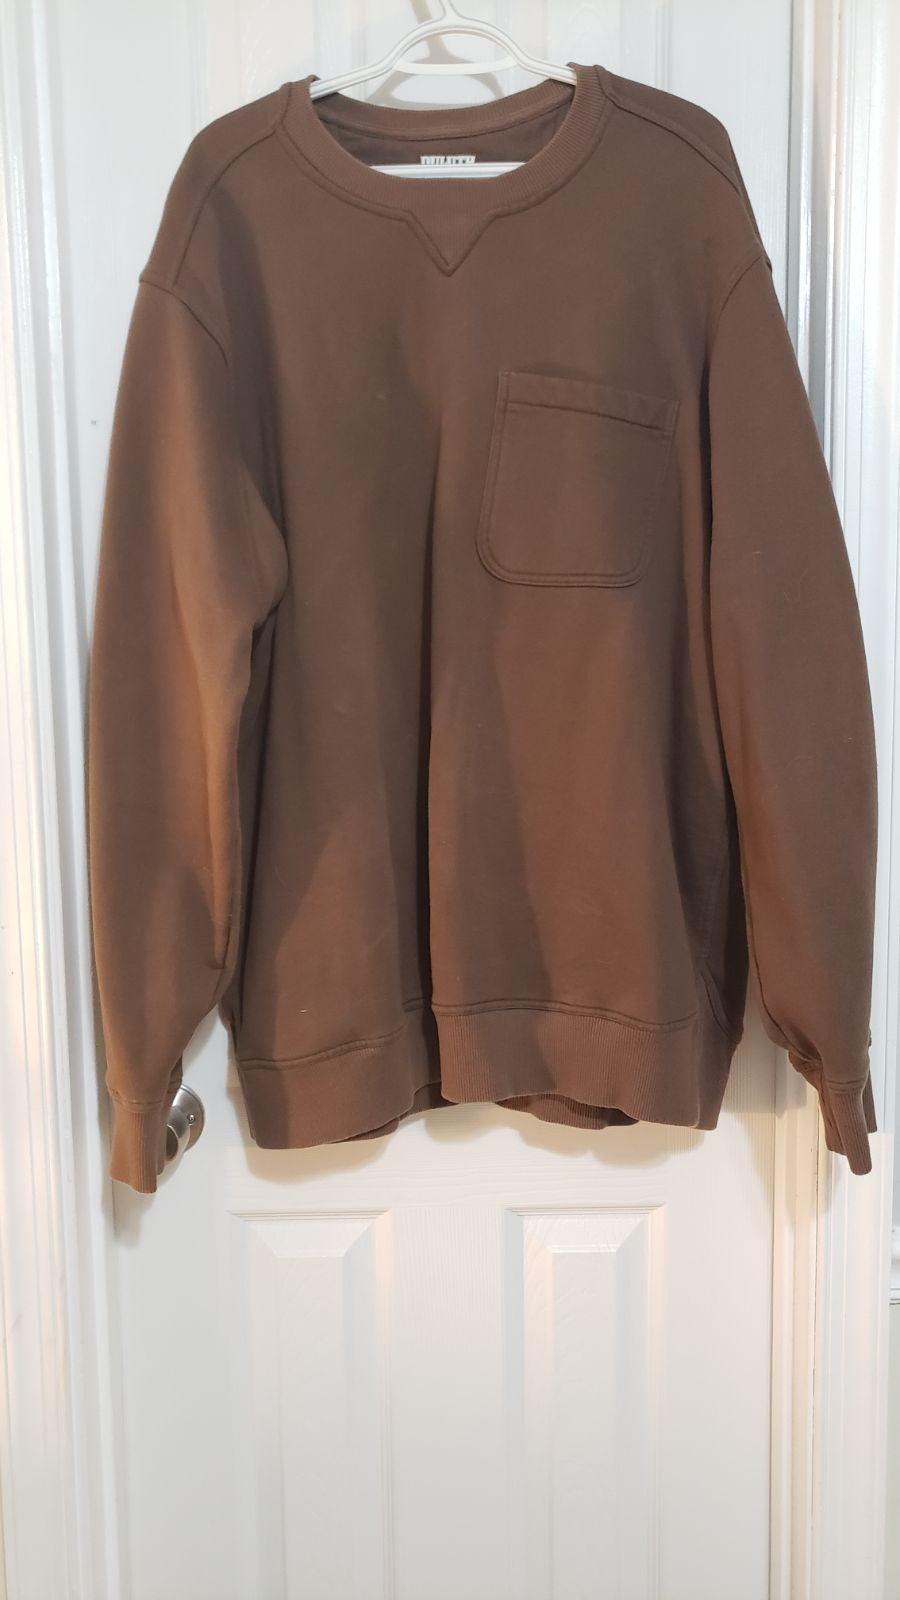 Duluth trading co. Sweatshirt (lot of 2